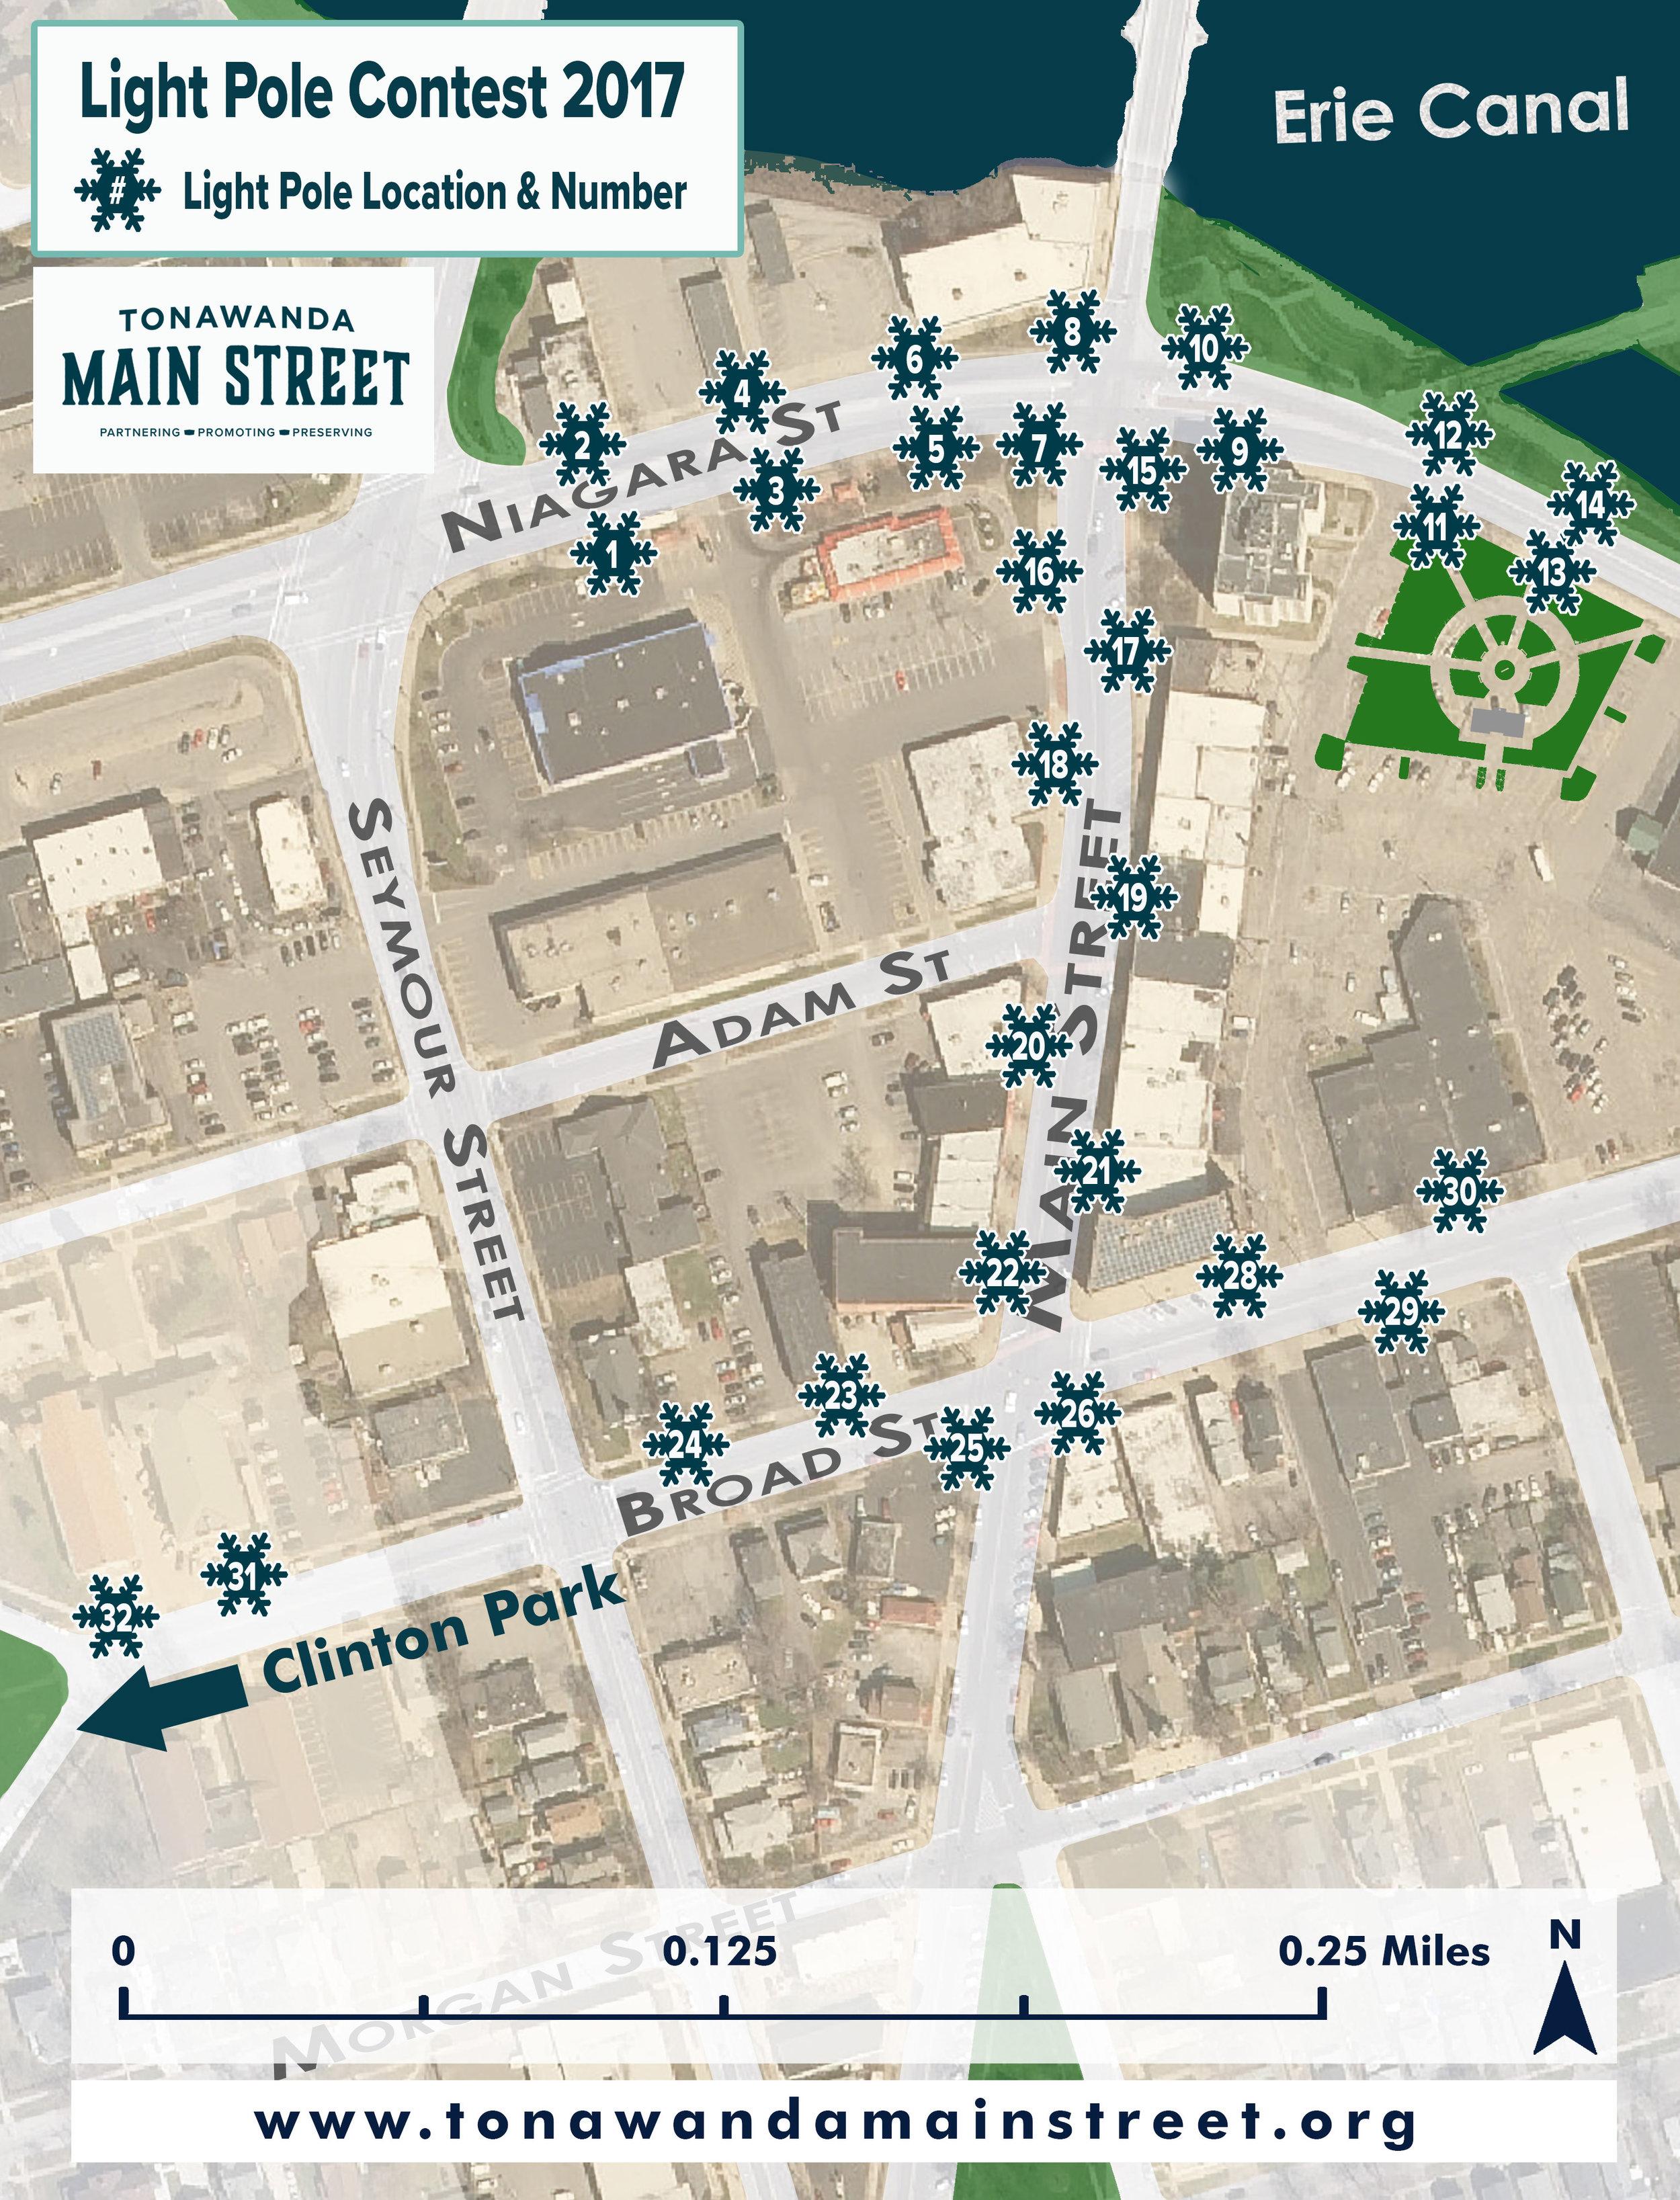 Map of Main Street Area - Light poles5.jpg